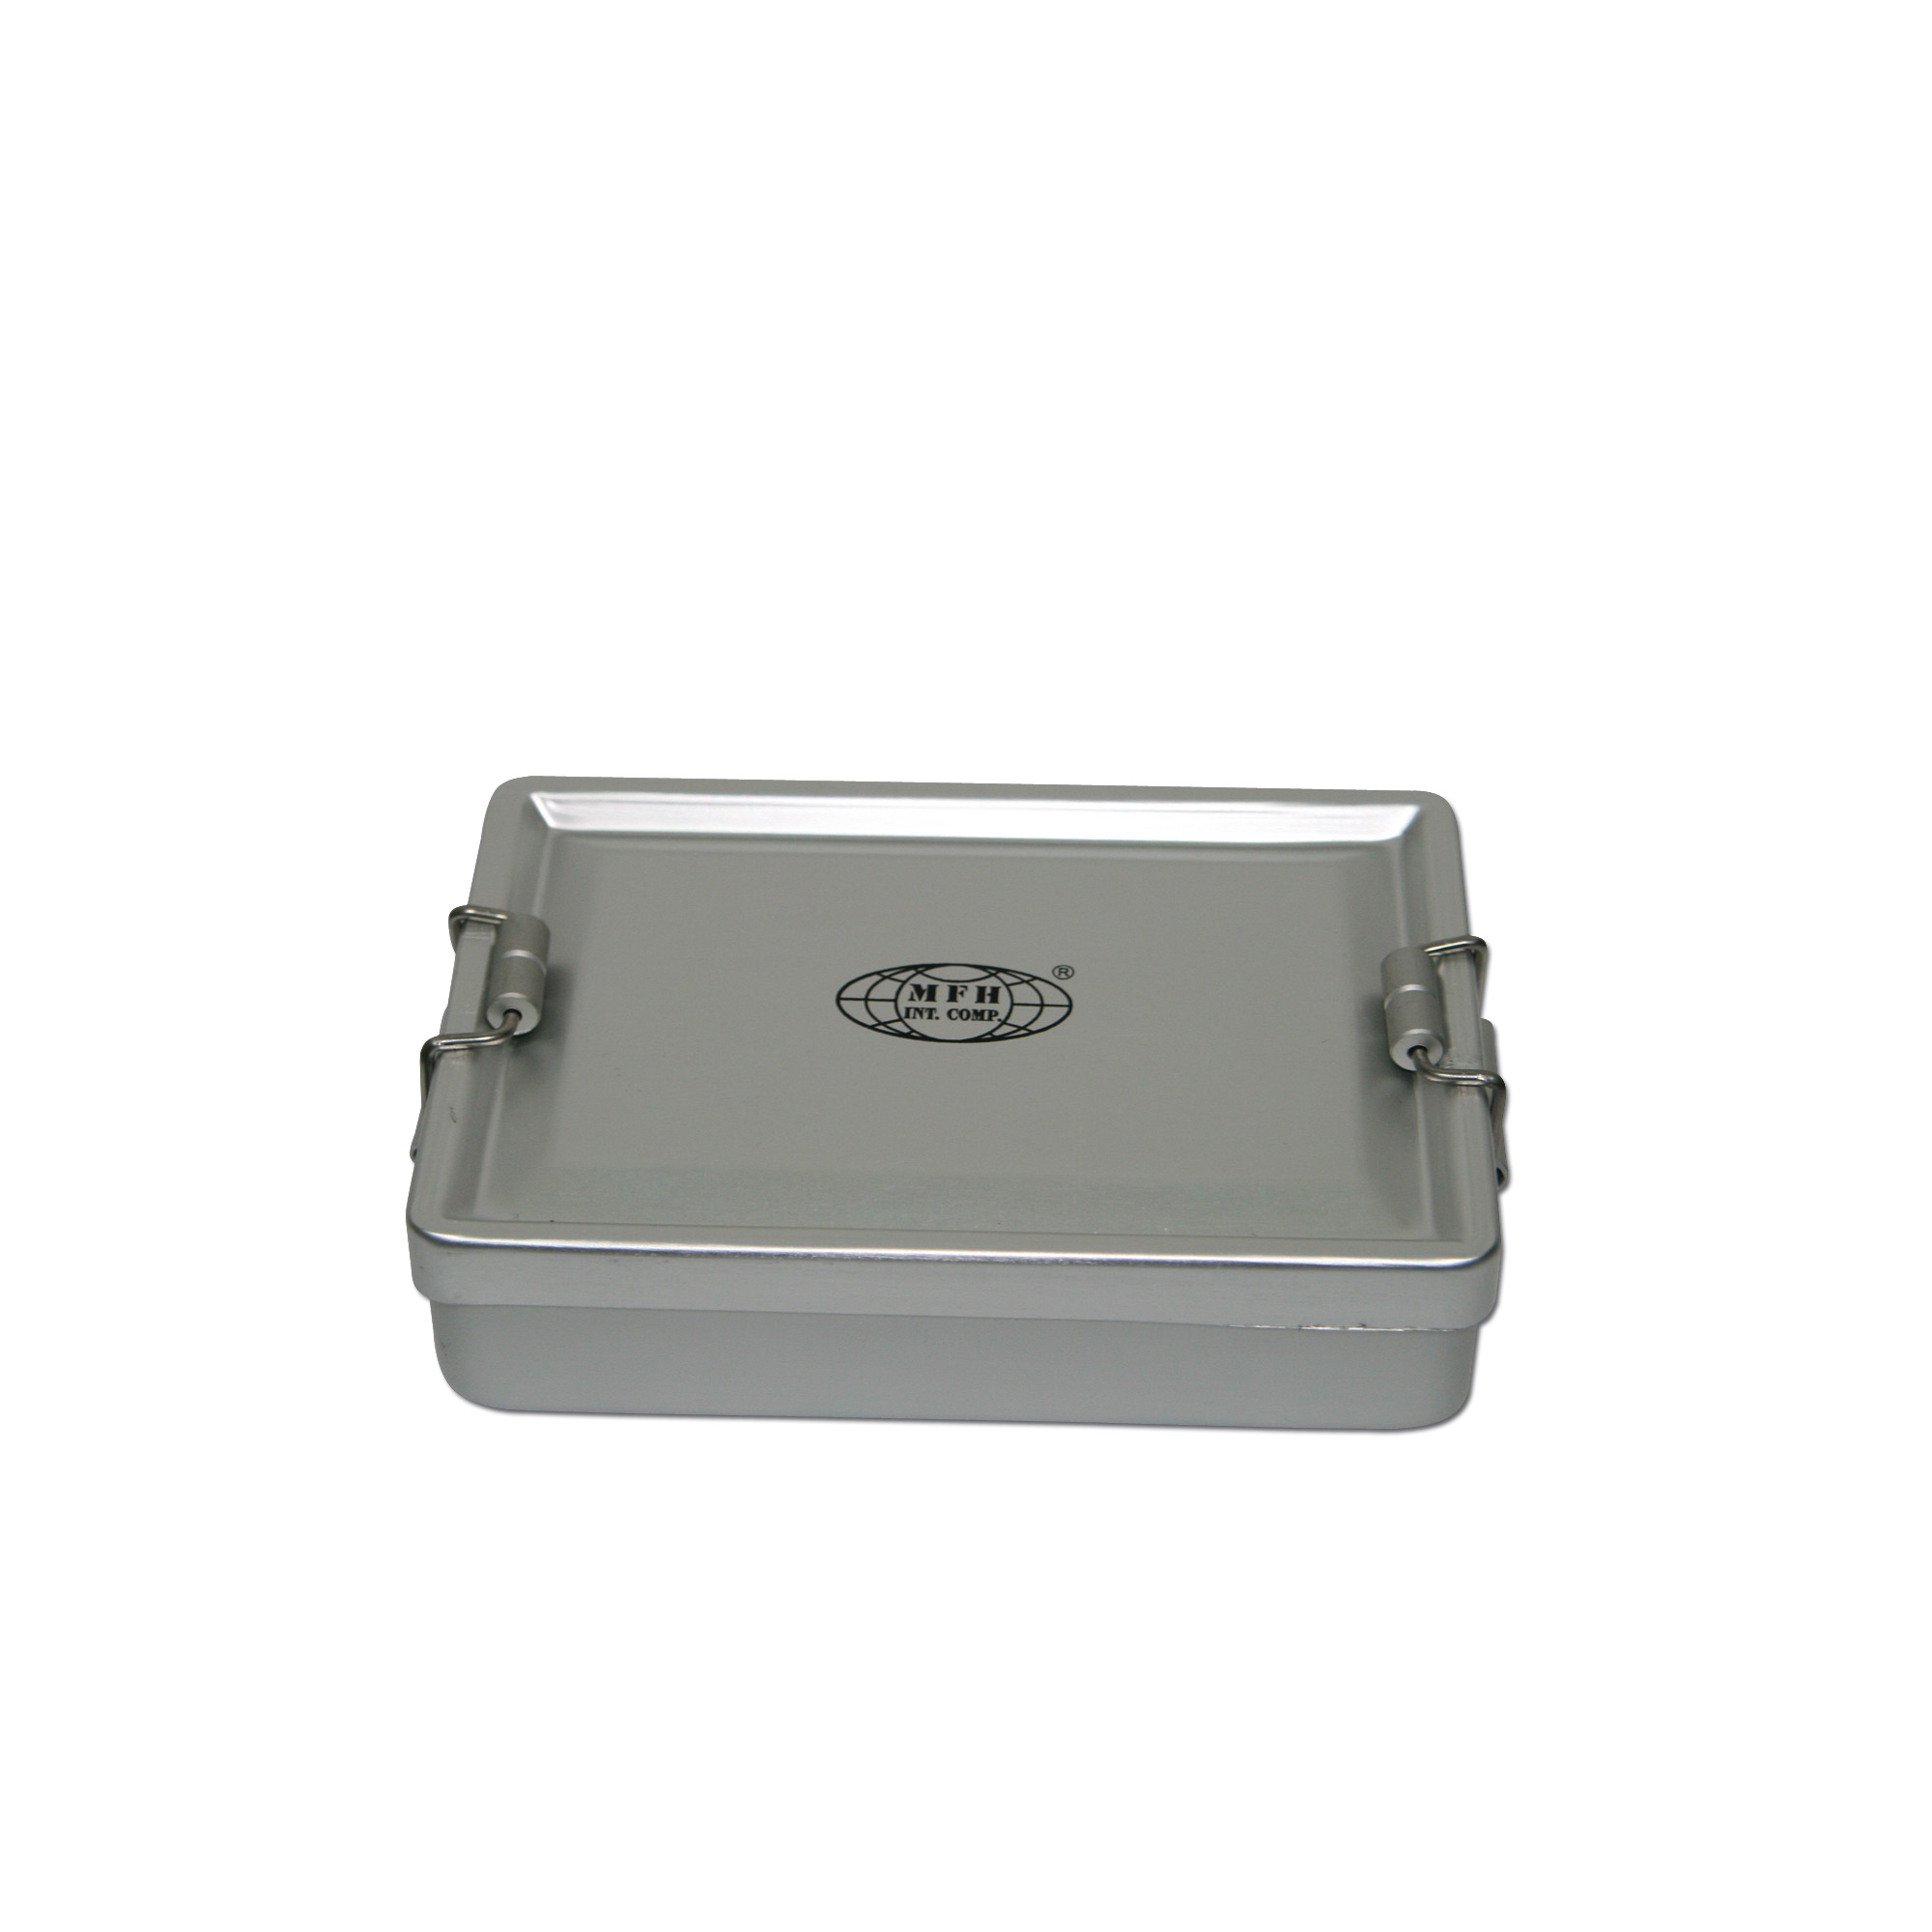 Wasserdichte Aluminiumbox 13,3 x 9,2 x 3,4 cm